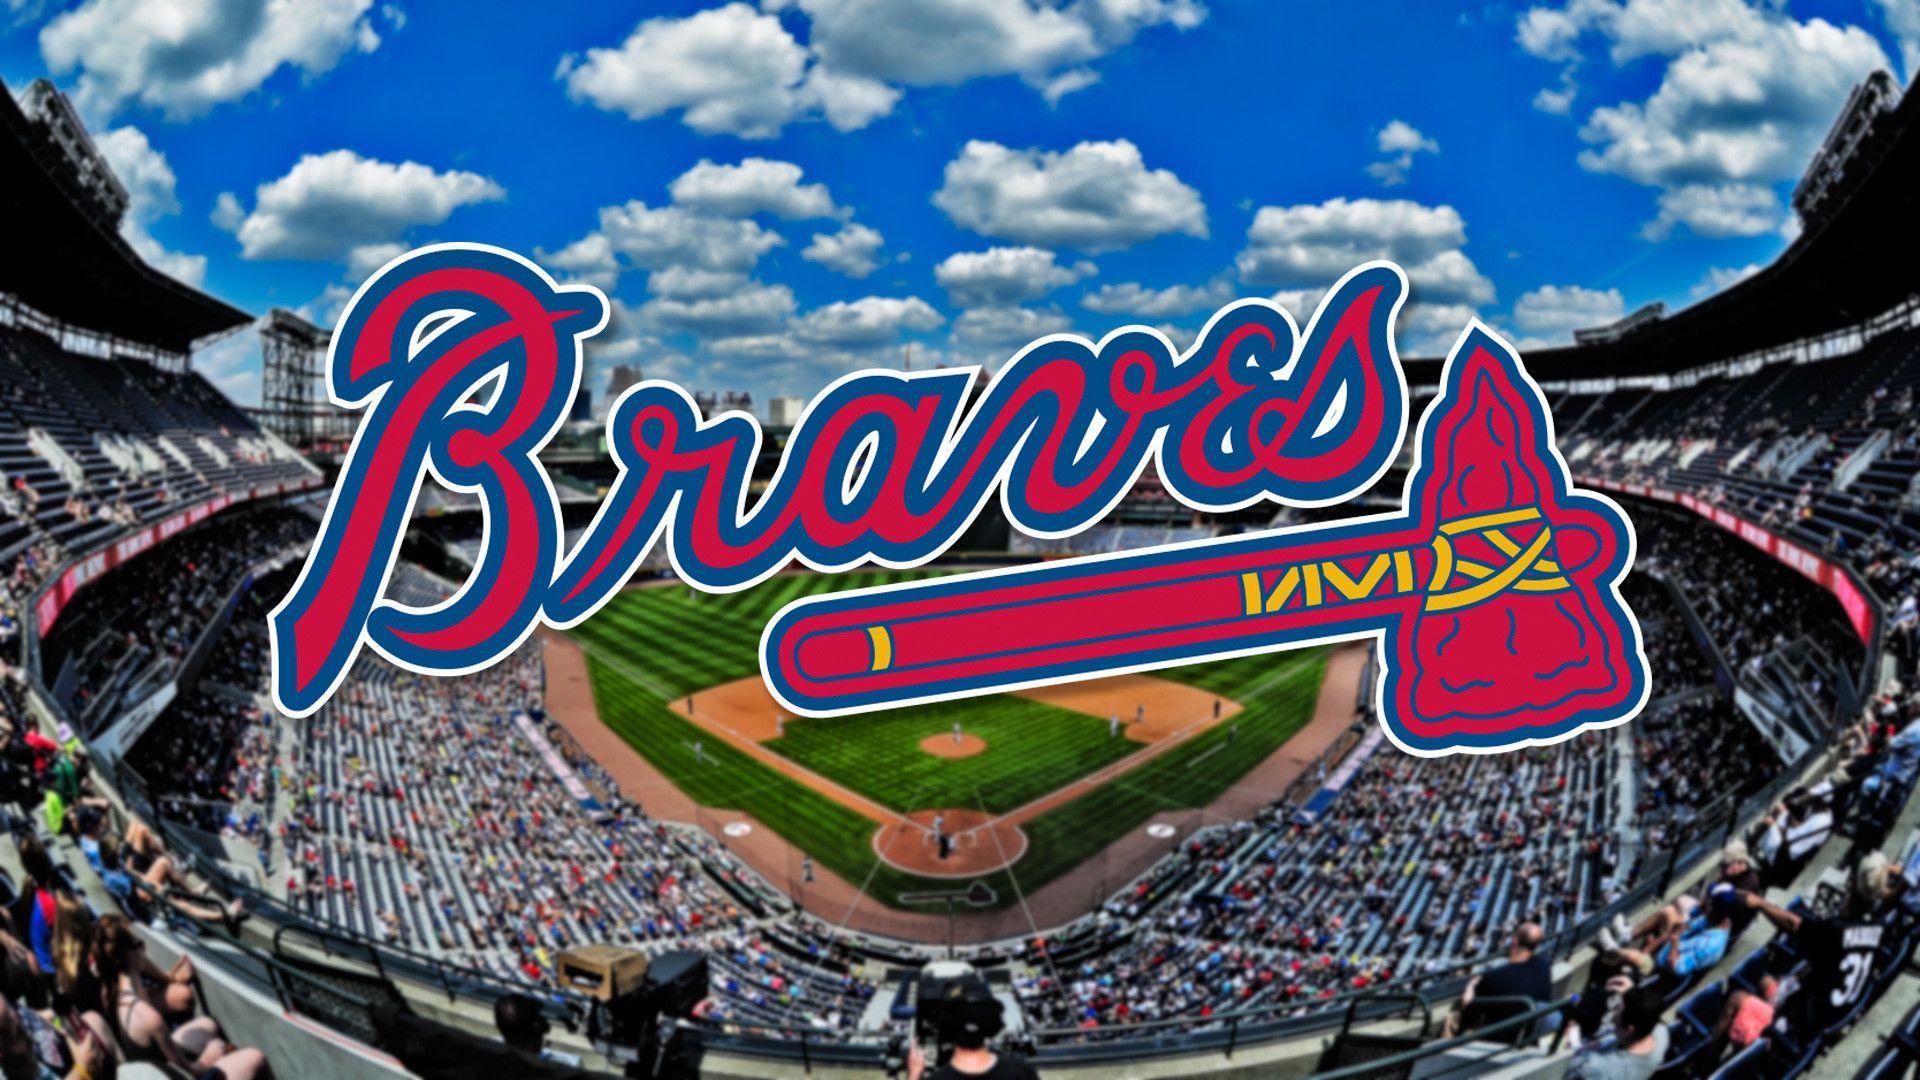 Atlanta Braves Wallpapers 62 Images: Atlanta Braves 2018 Wallpapers